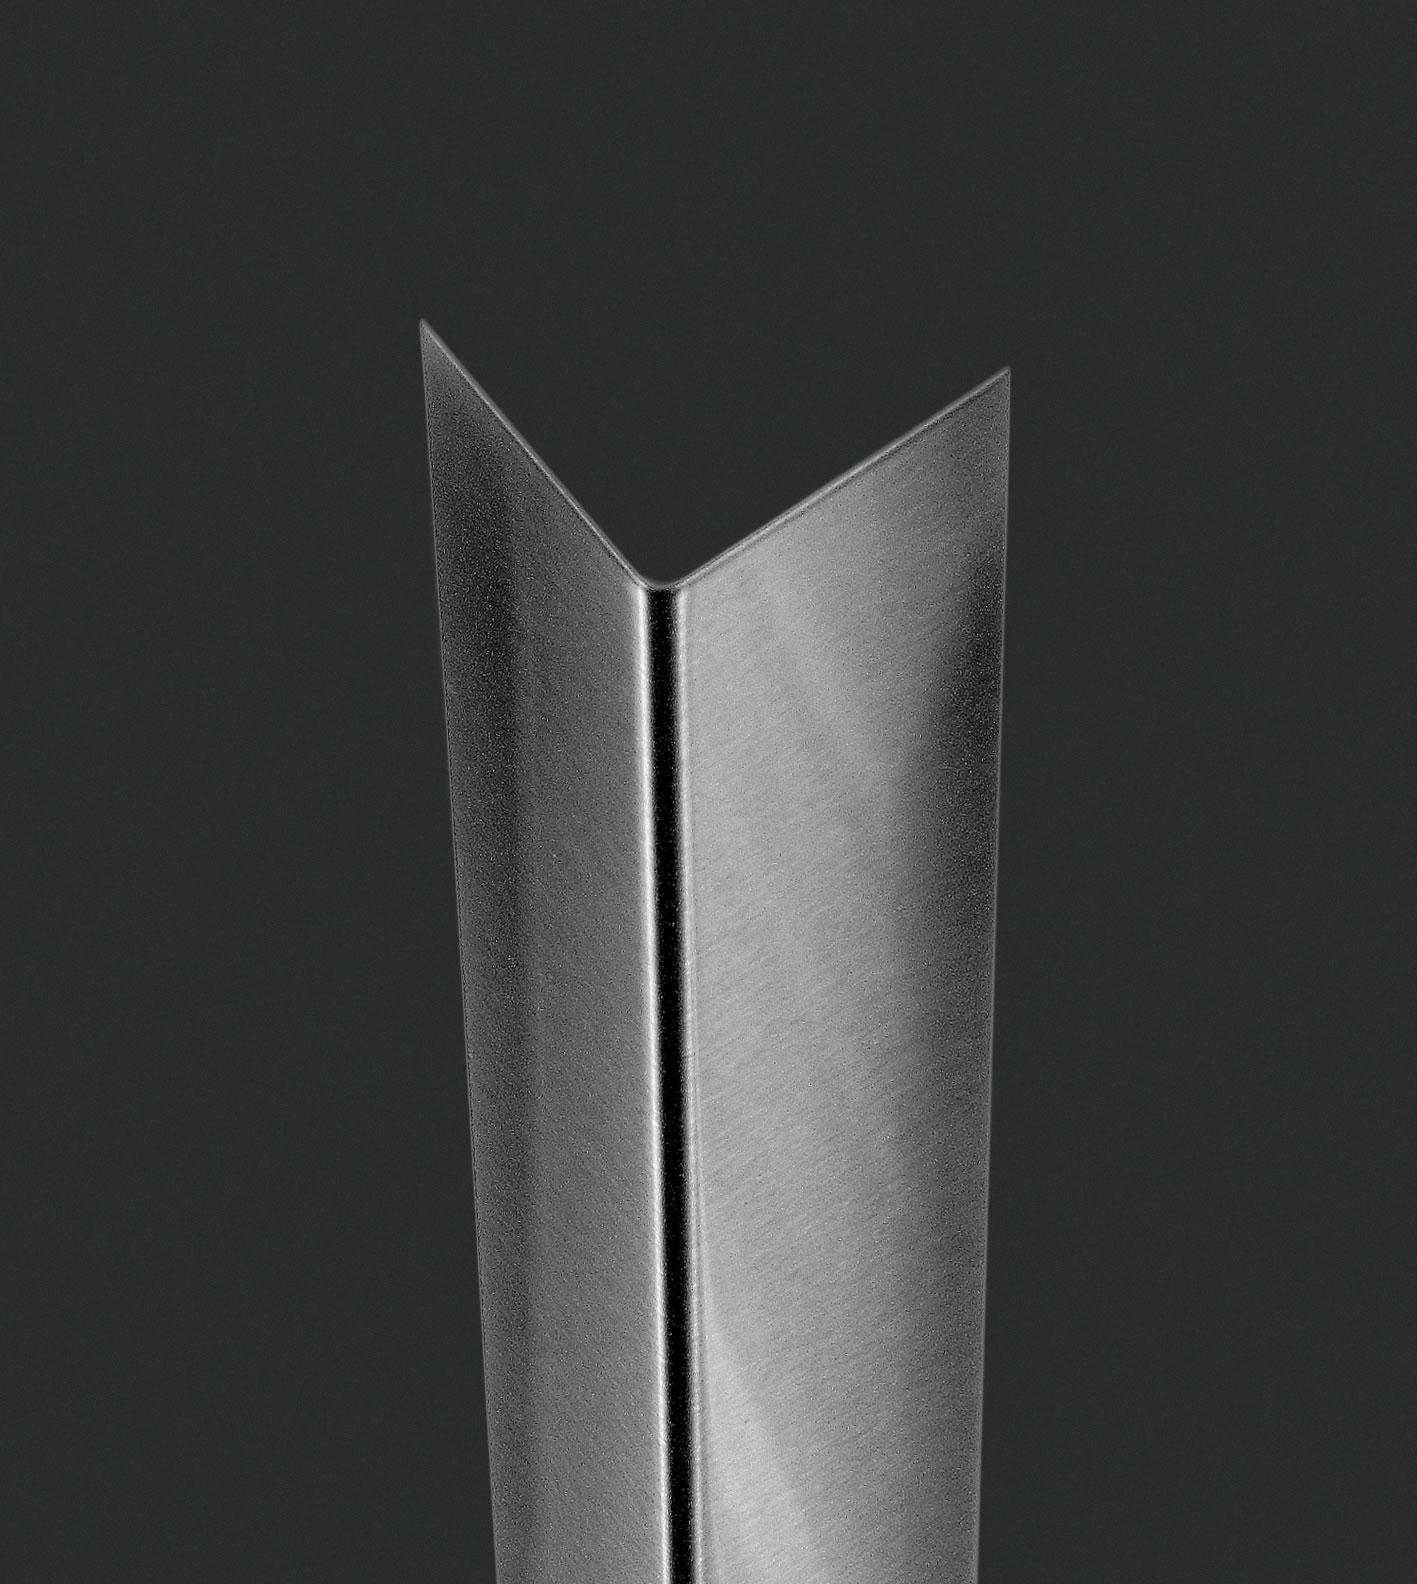 Steel Corner Protection : Corner guards metal stainless steel wall protector toronto